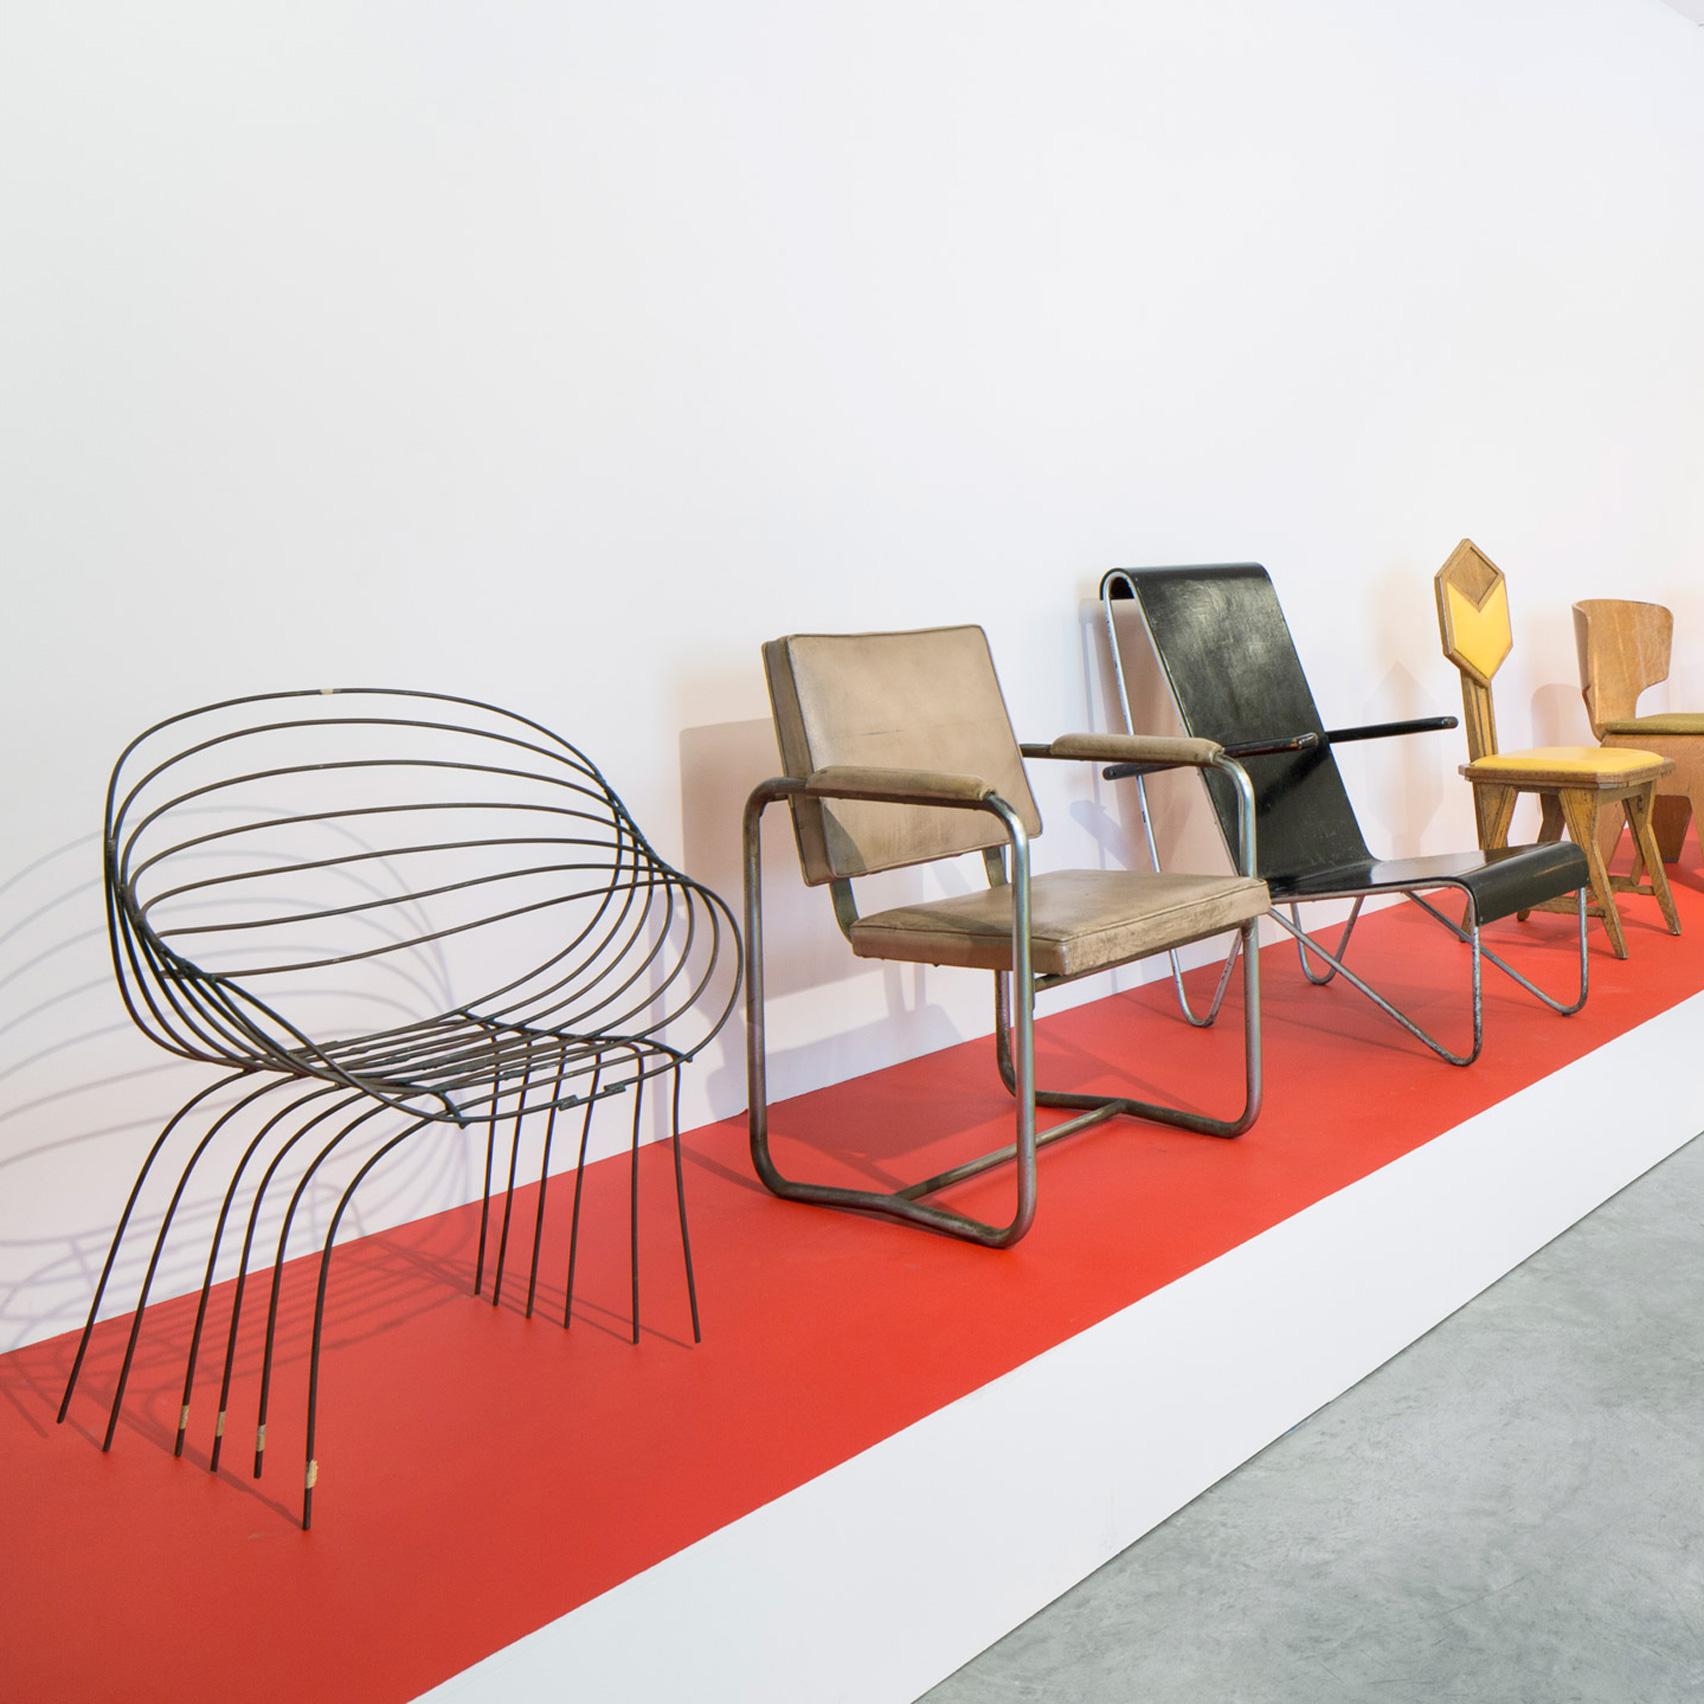 Exhibition design and architecture | Dezeen